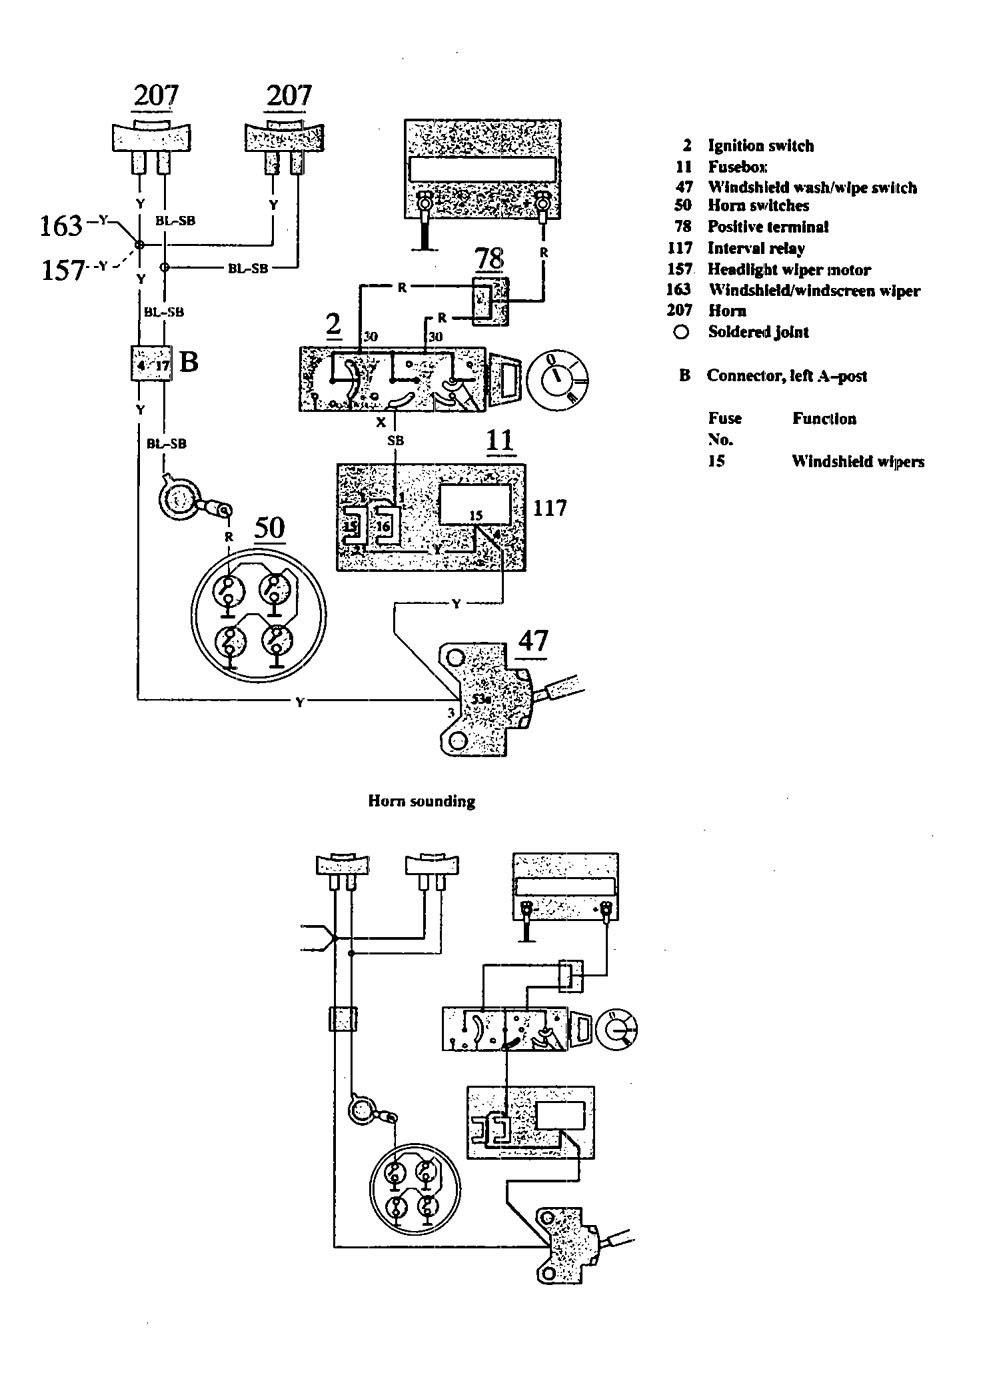 [DIAGRAM] 1998 Plymouth Breeze Wiring Diagram FULL Version